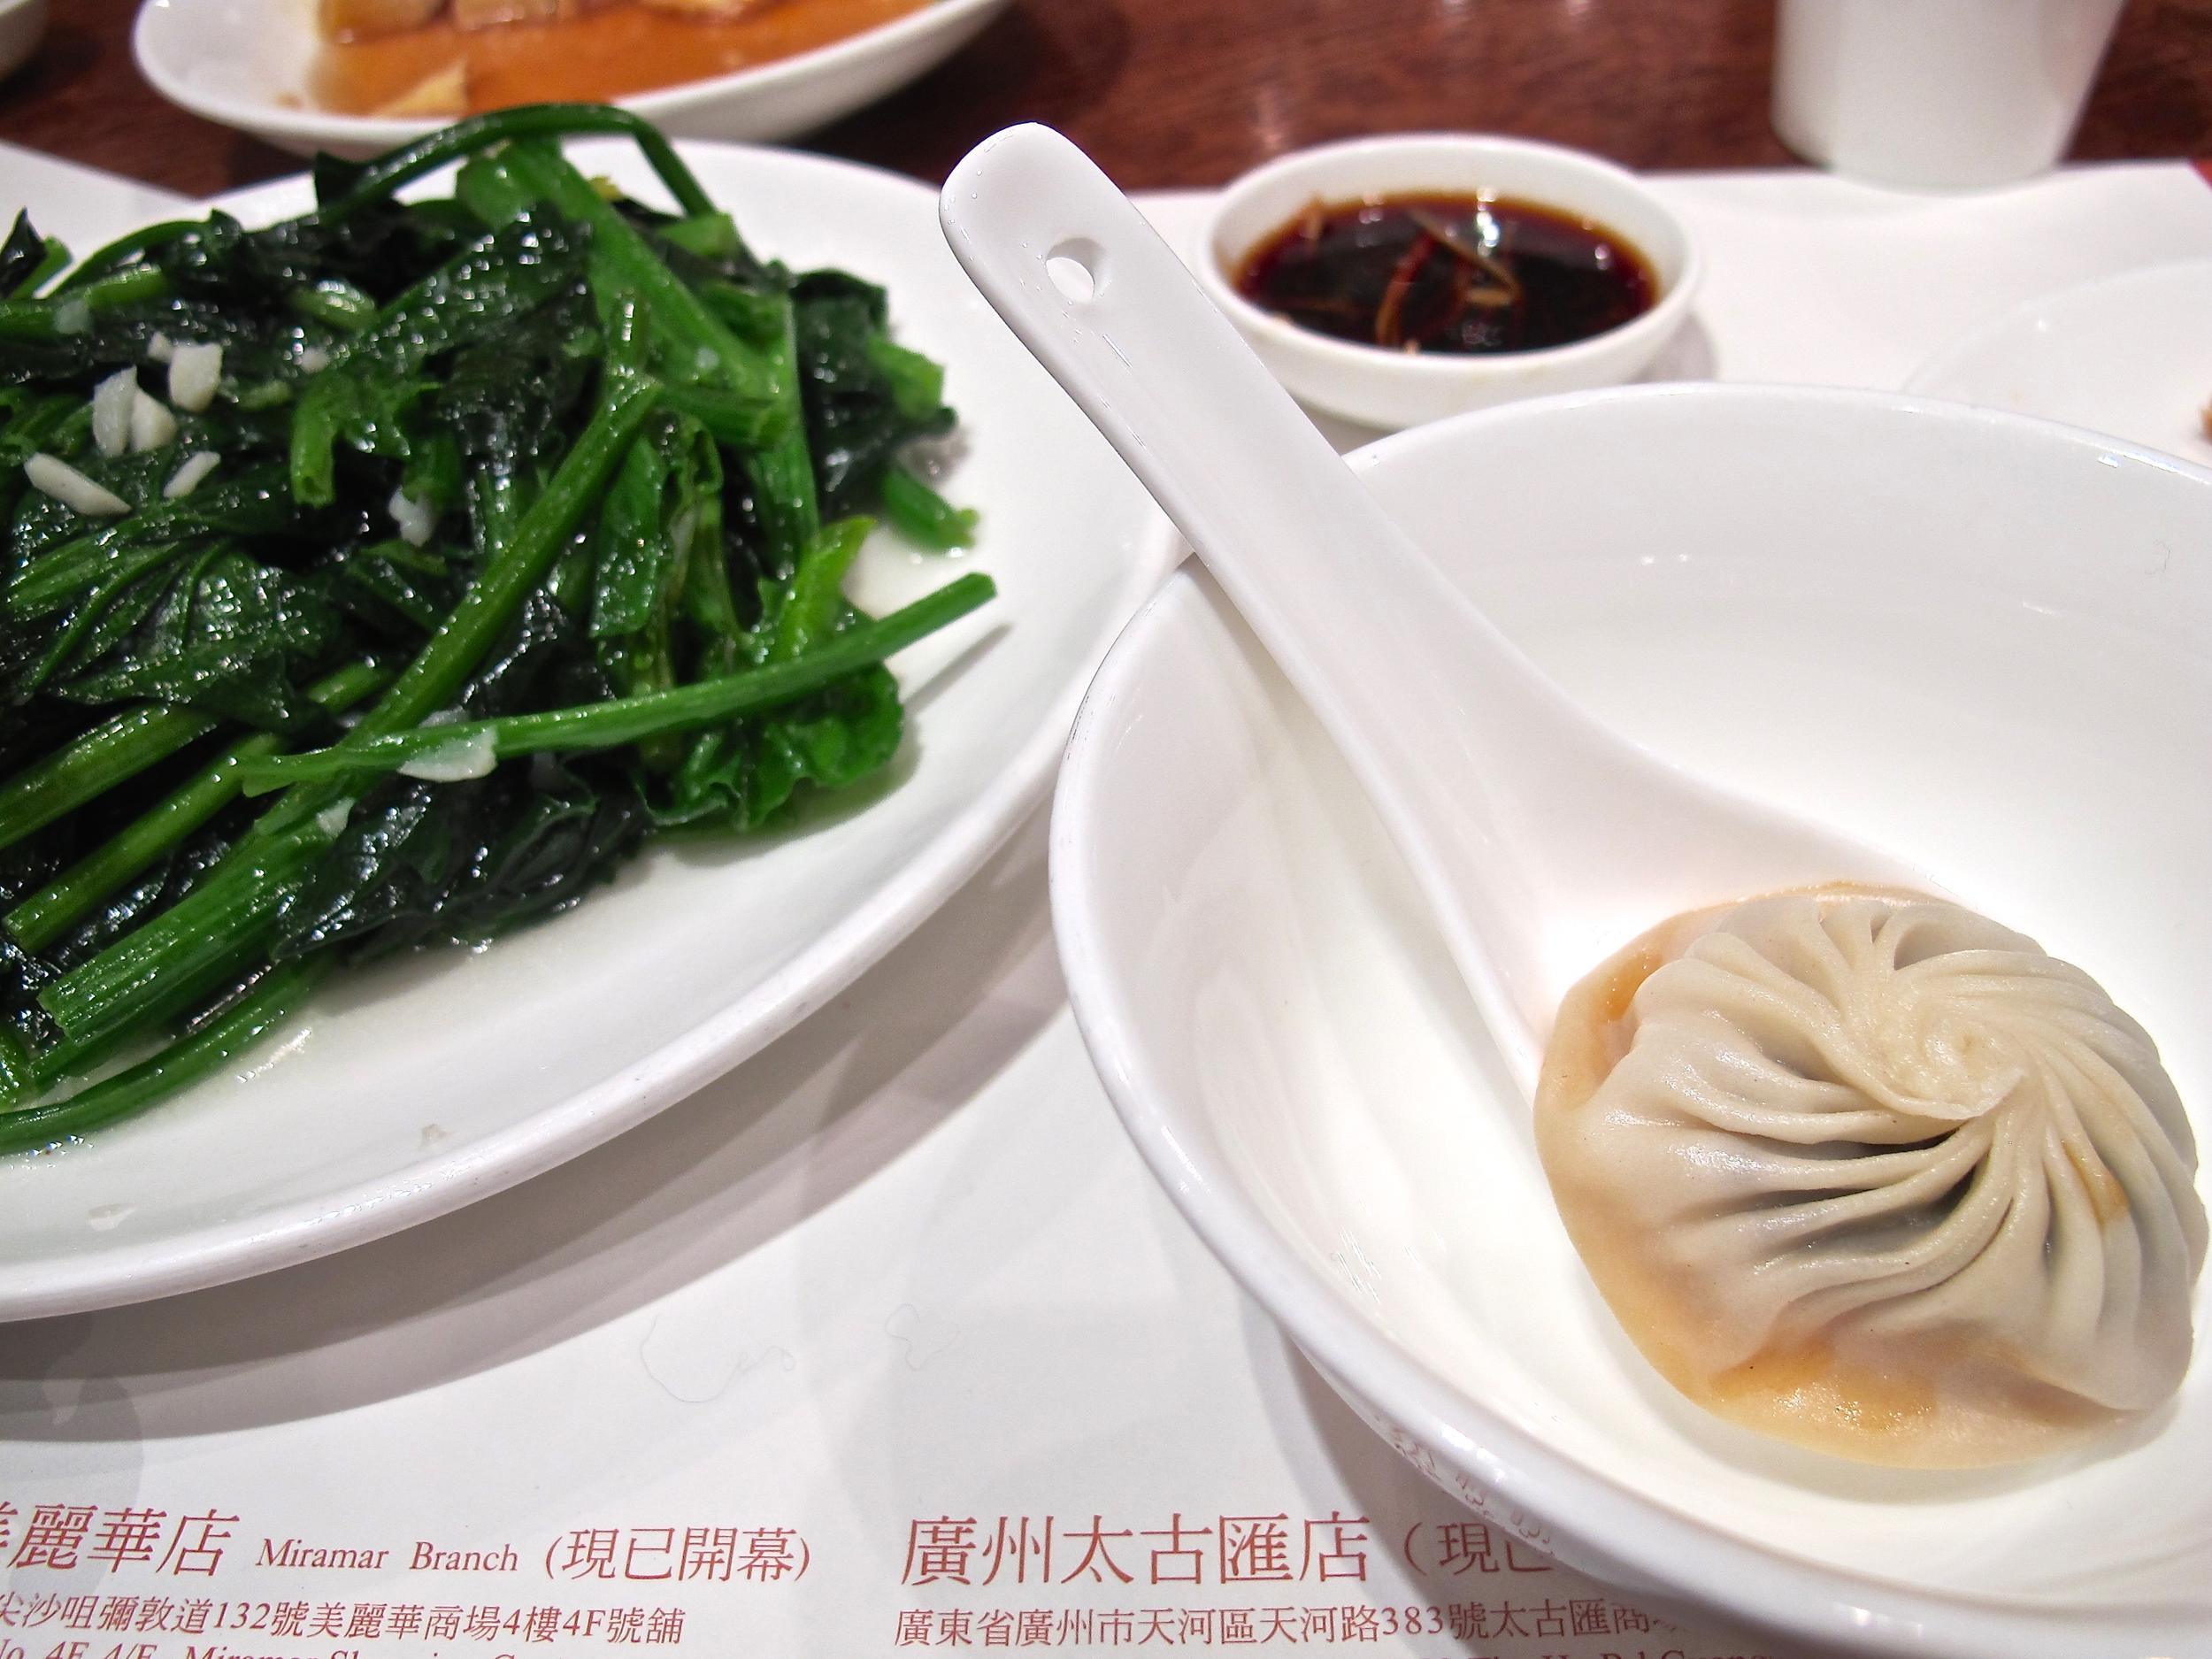 Din Tai Fung Hong Kong.JPG